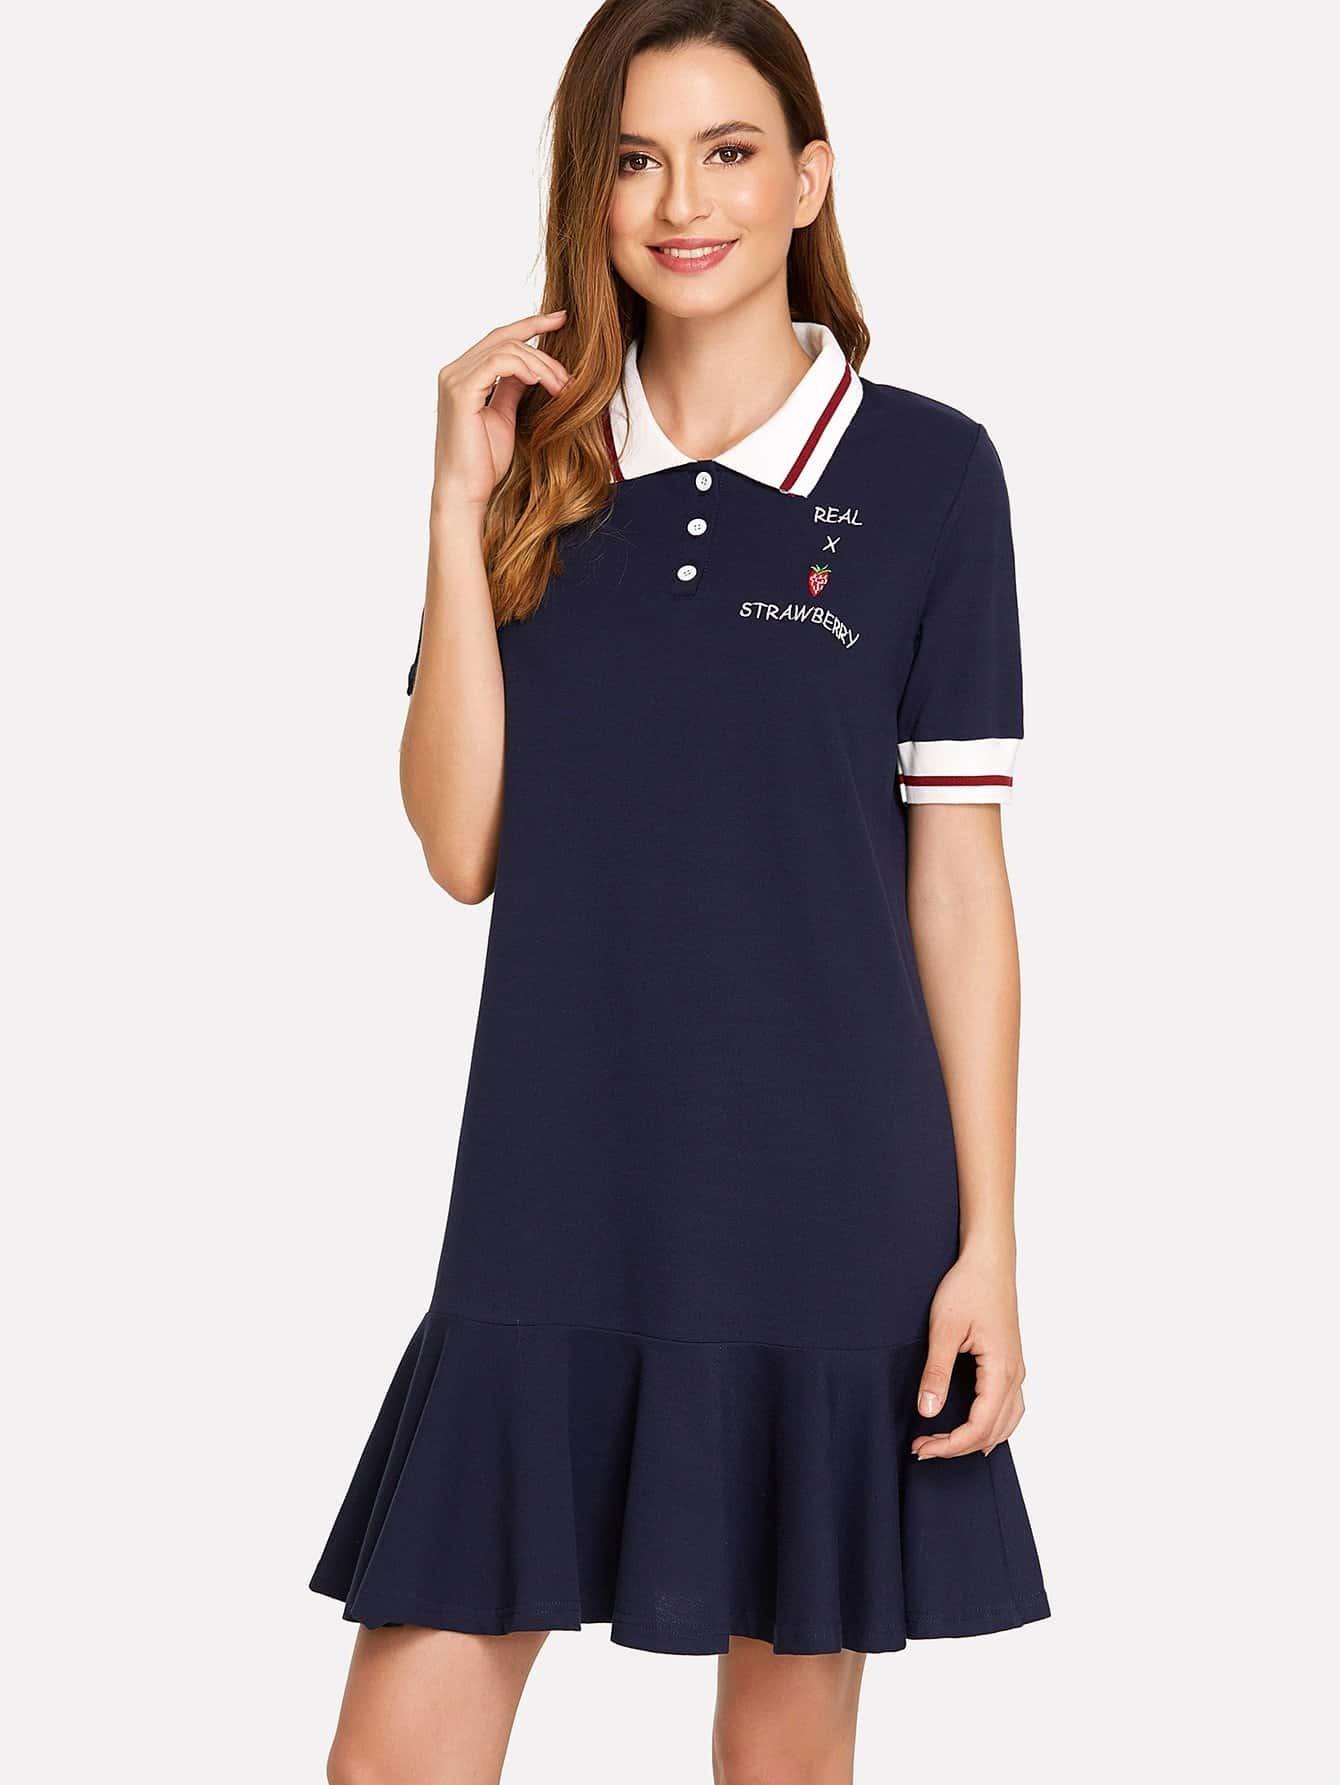 Letter Embroidered Stripe Contrast Ruffle Hem Dress stripe contrast ruffle hem hooded dress